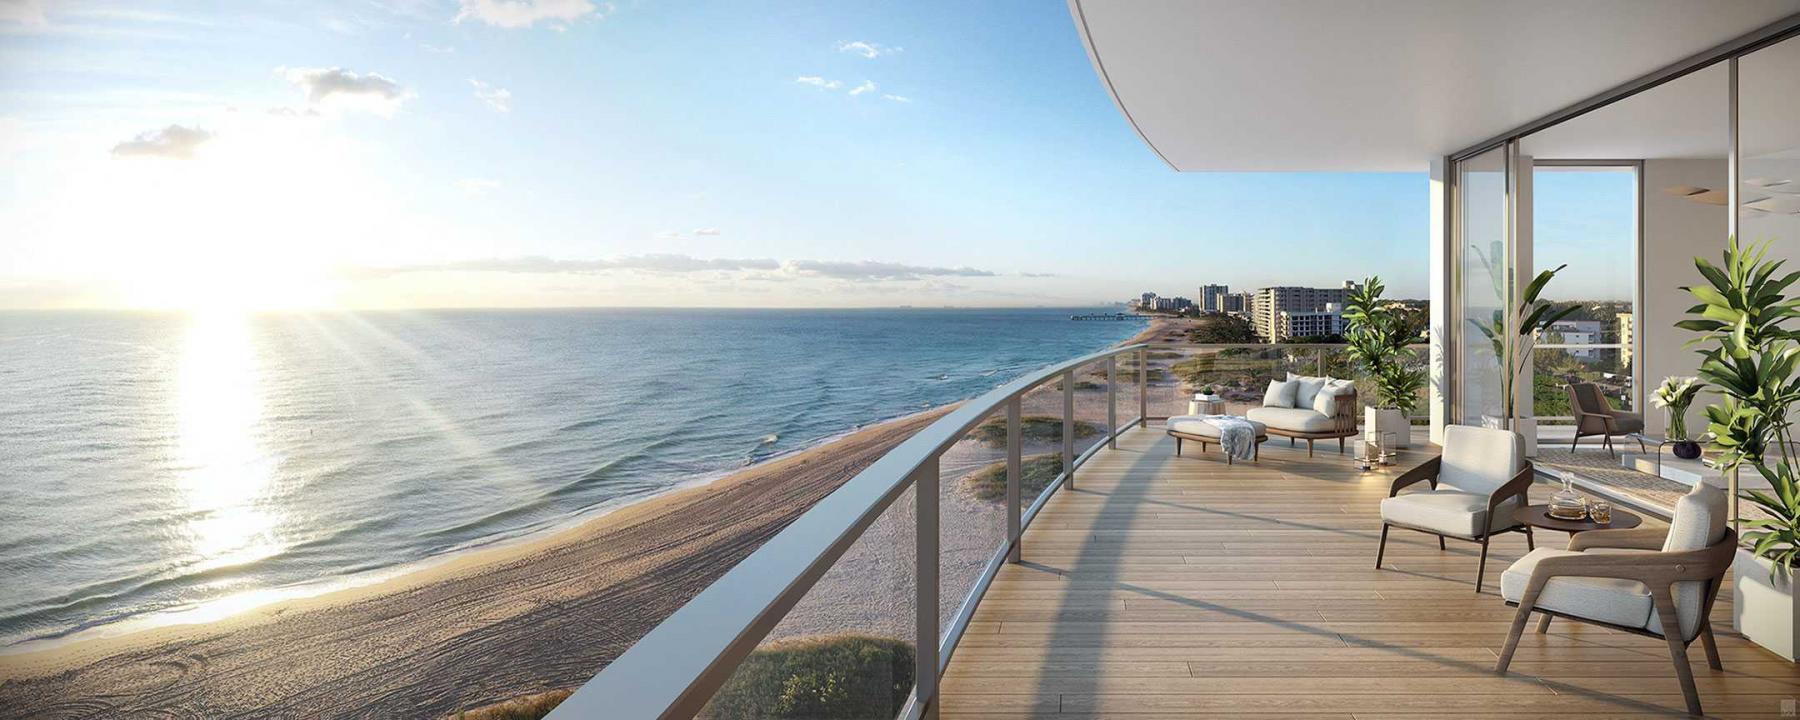 Solemar Pompano Beach - Condos for Sale